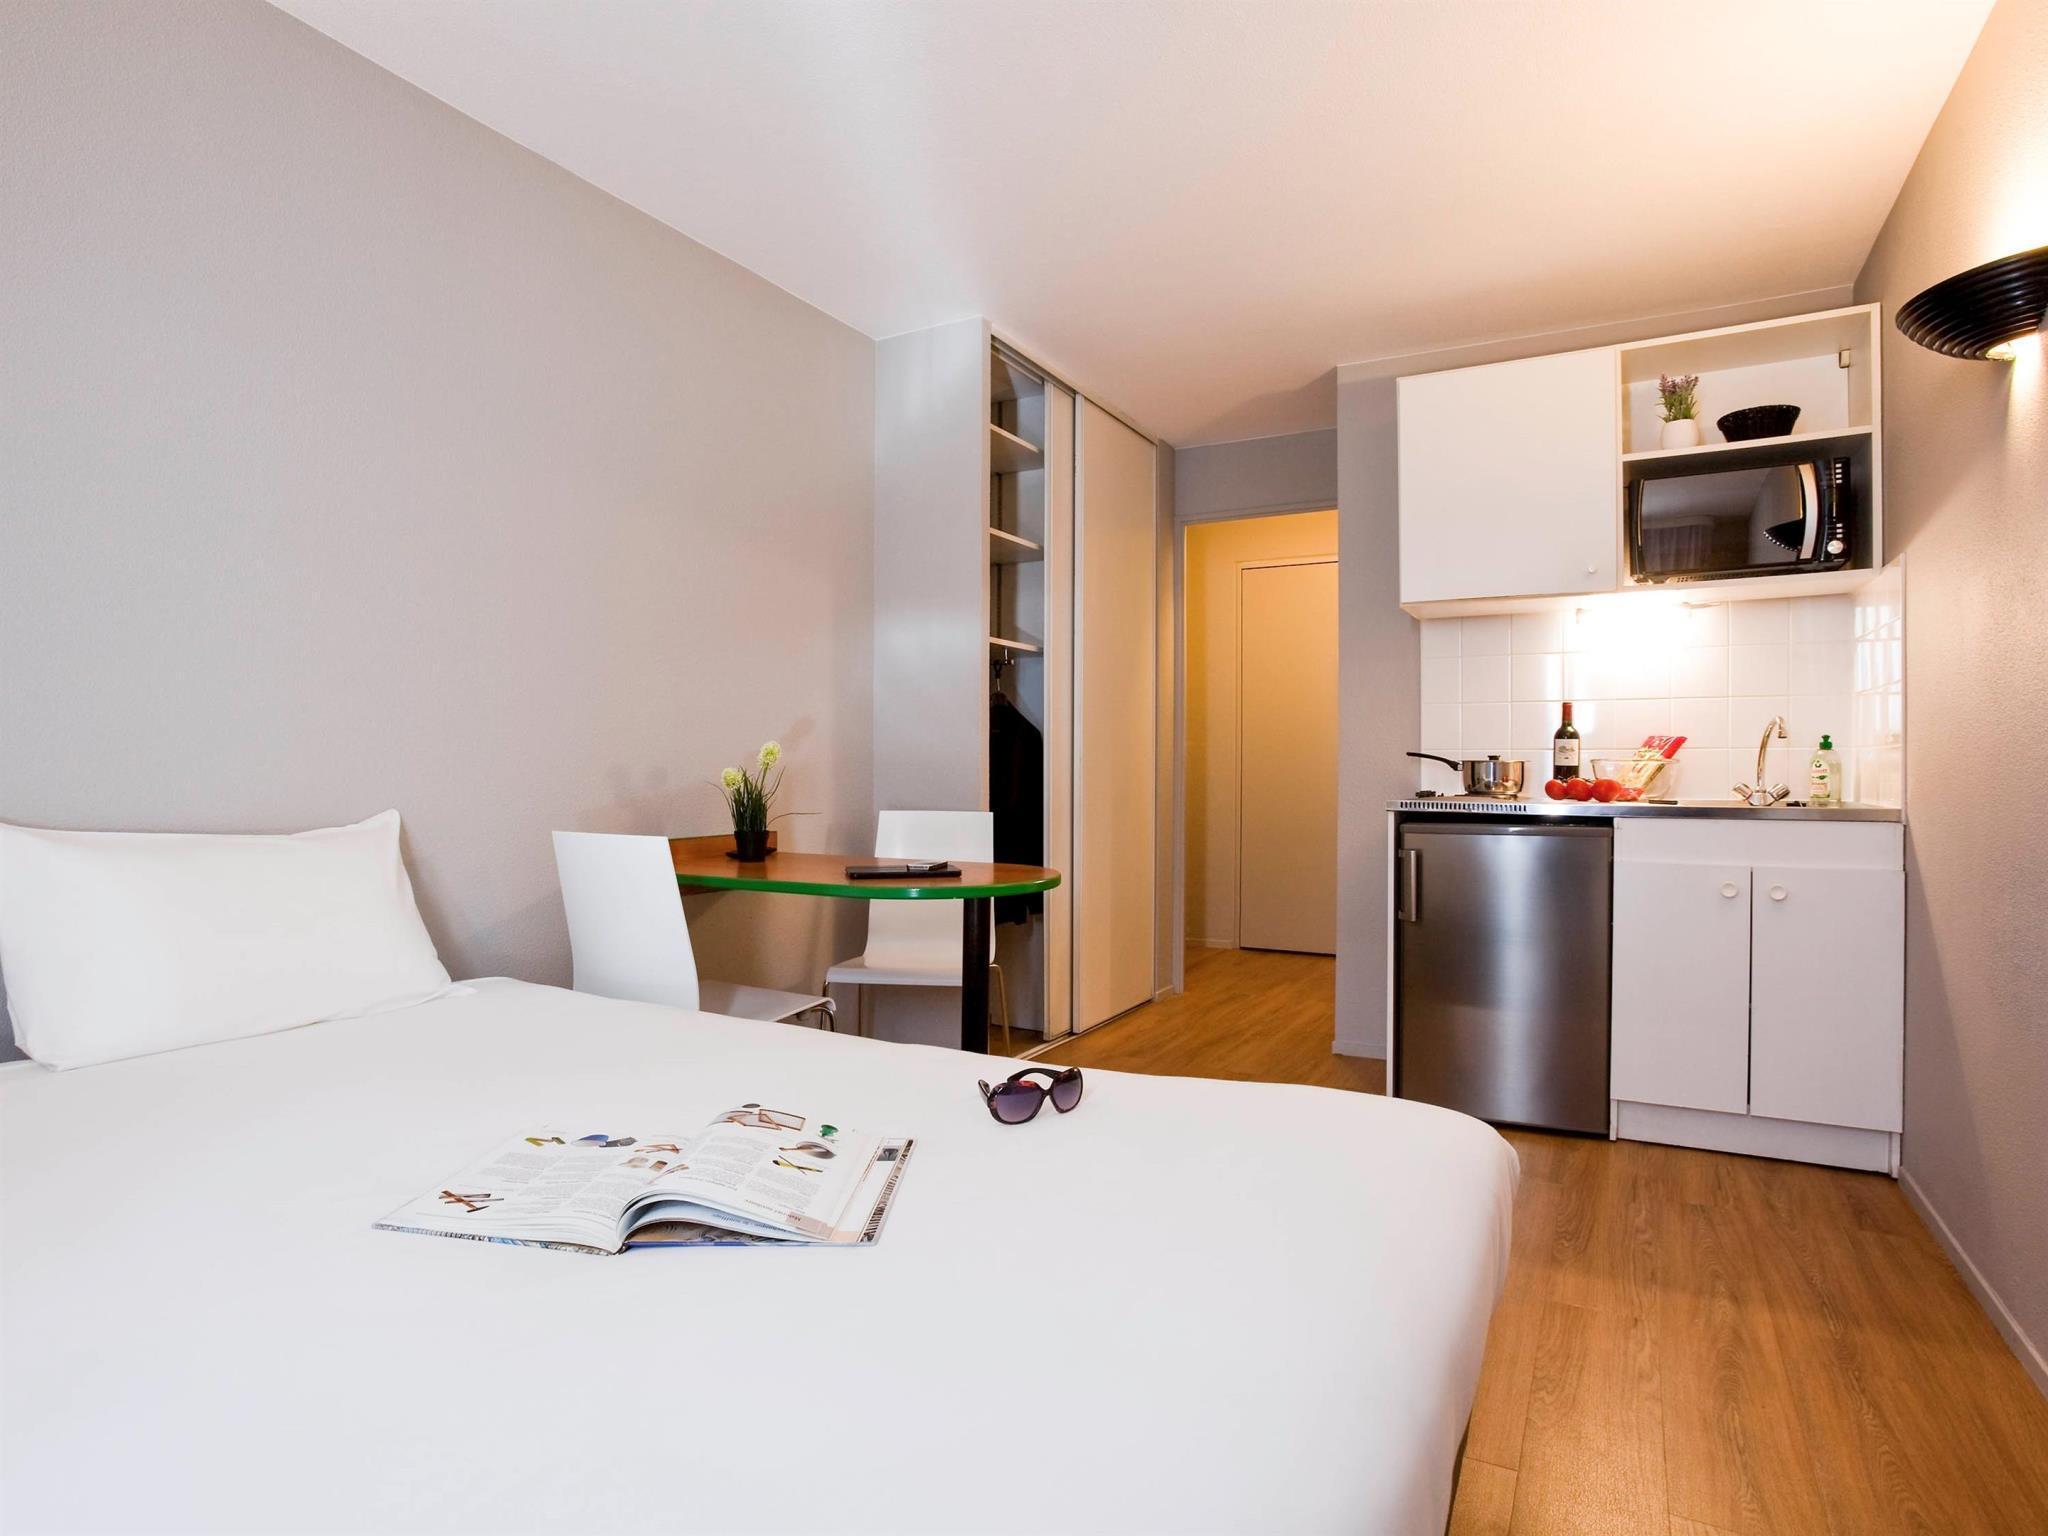 Adagio Access Paris Maisons Alfort Aparthotel Serviced Apartment Deals Photos Reviews